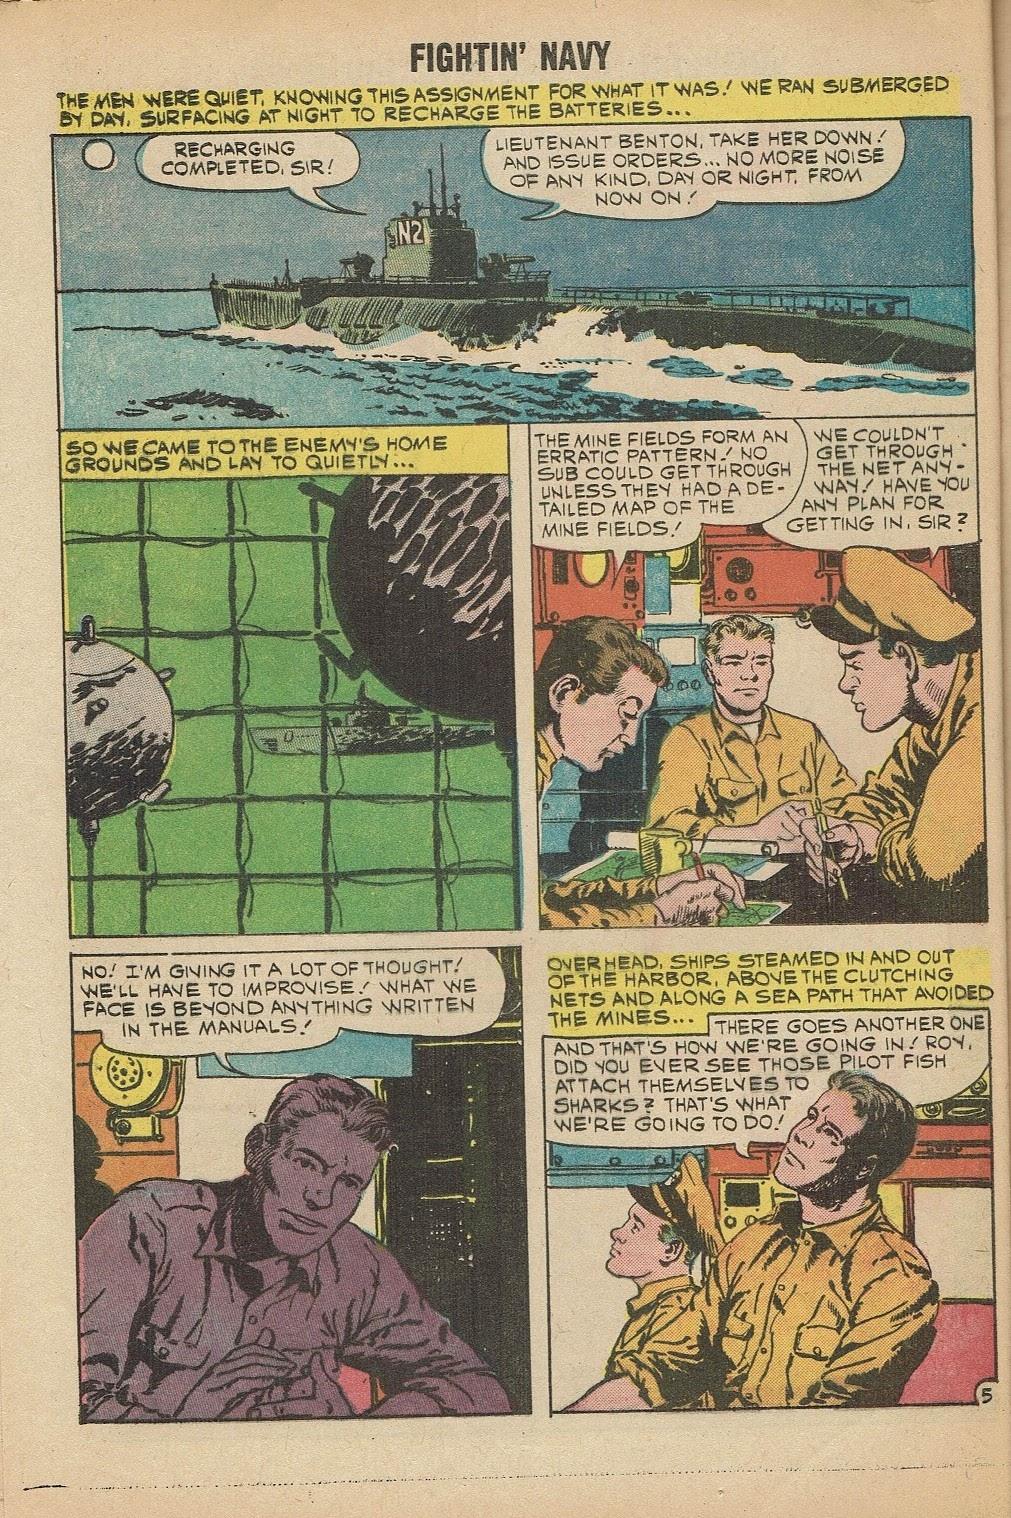 Read online Fightin' Navy comic -  Issue #91 - 8